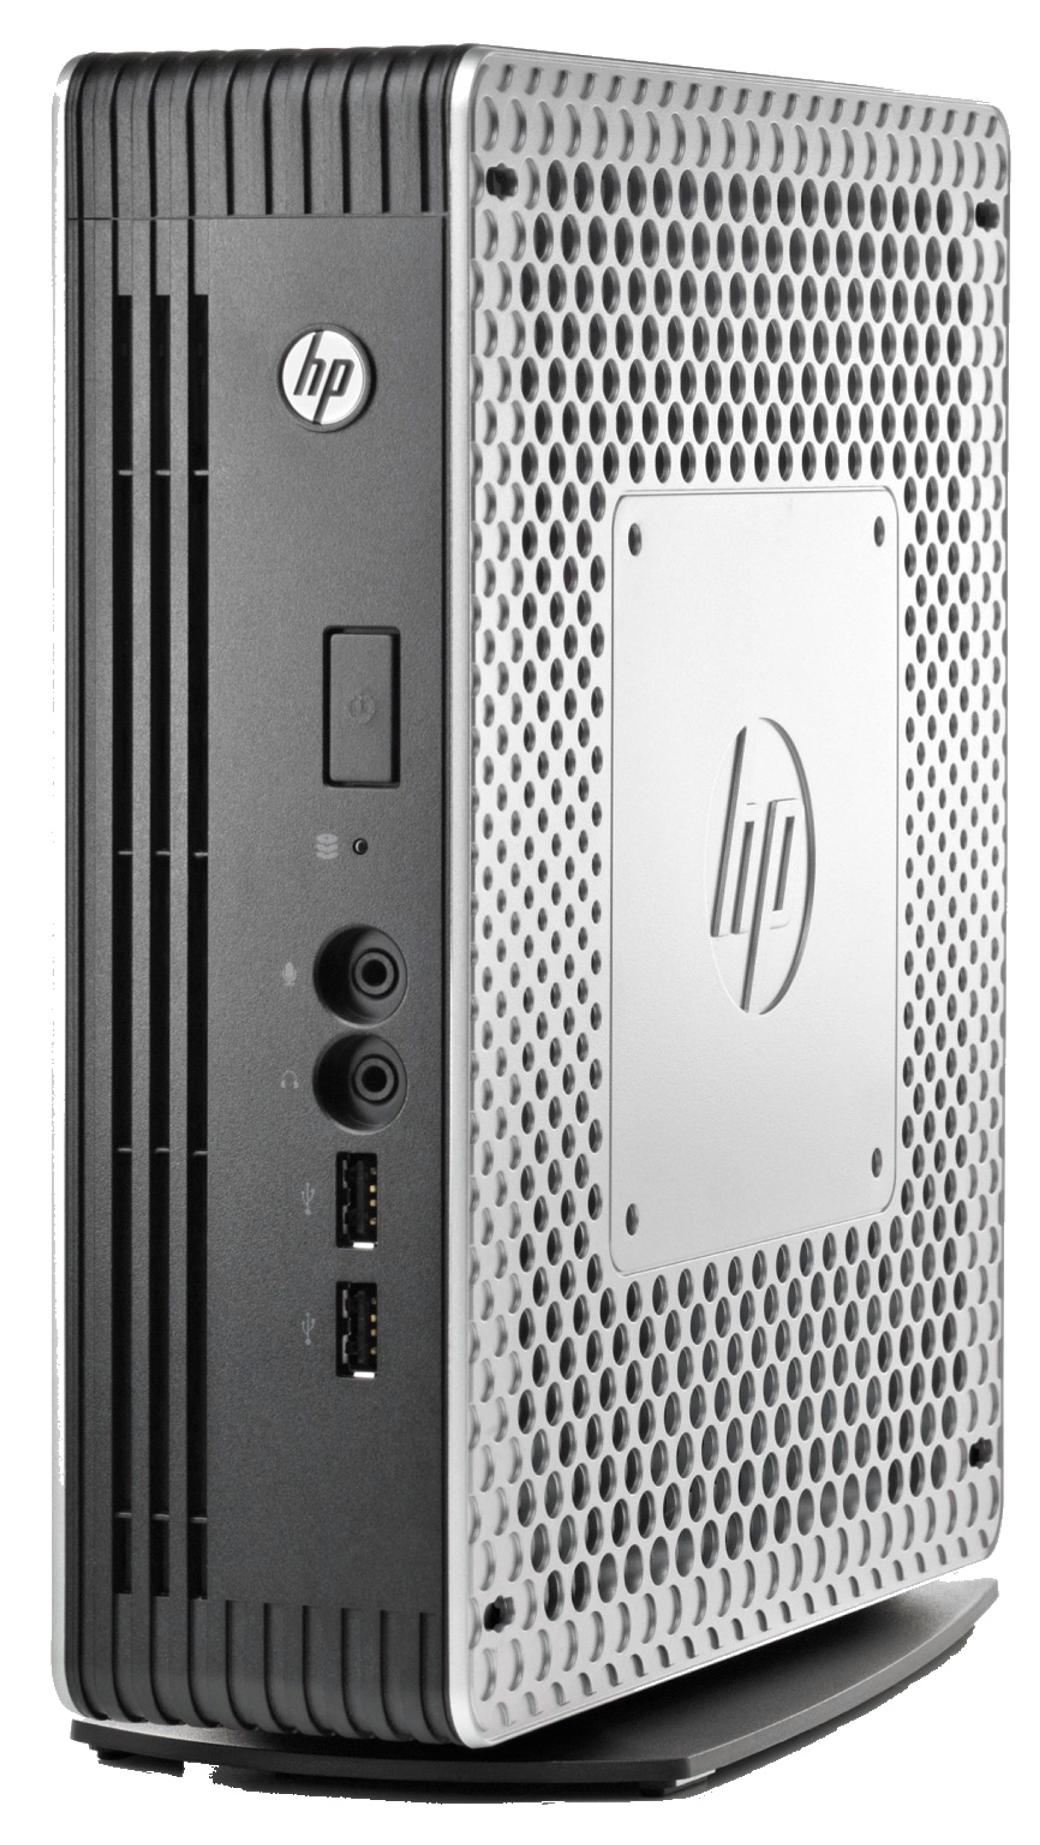 HP t610 PLUS Flexible Thin Client Dual Core (T56N) 1.65GHz 4GB 16GB Flash WLAN Windows 7 Standard Embedded (Radeon HD 6320)